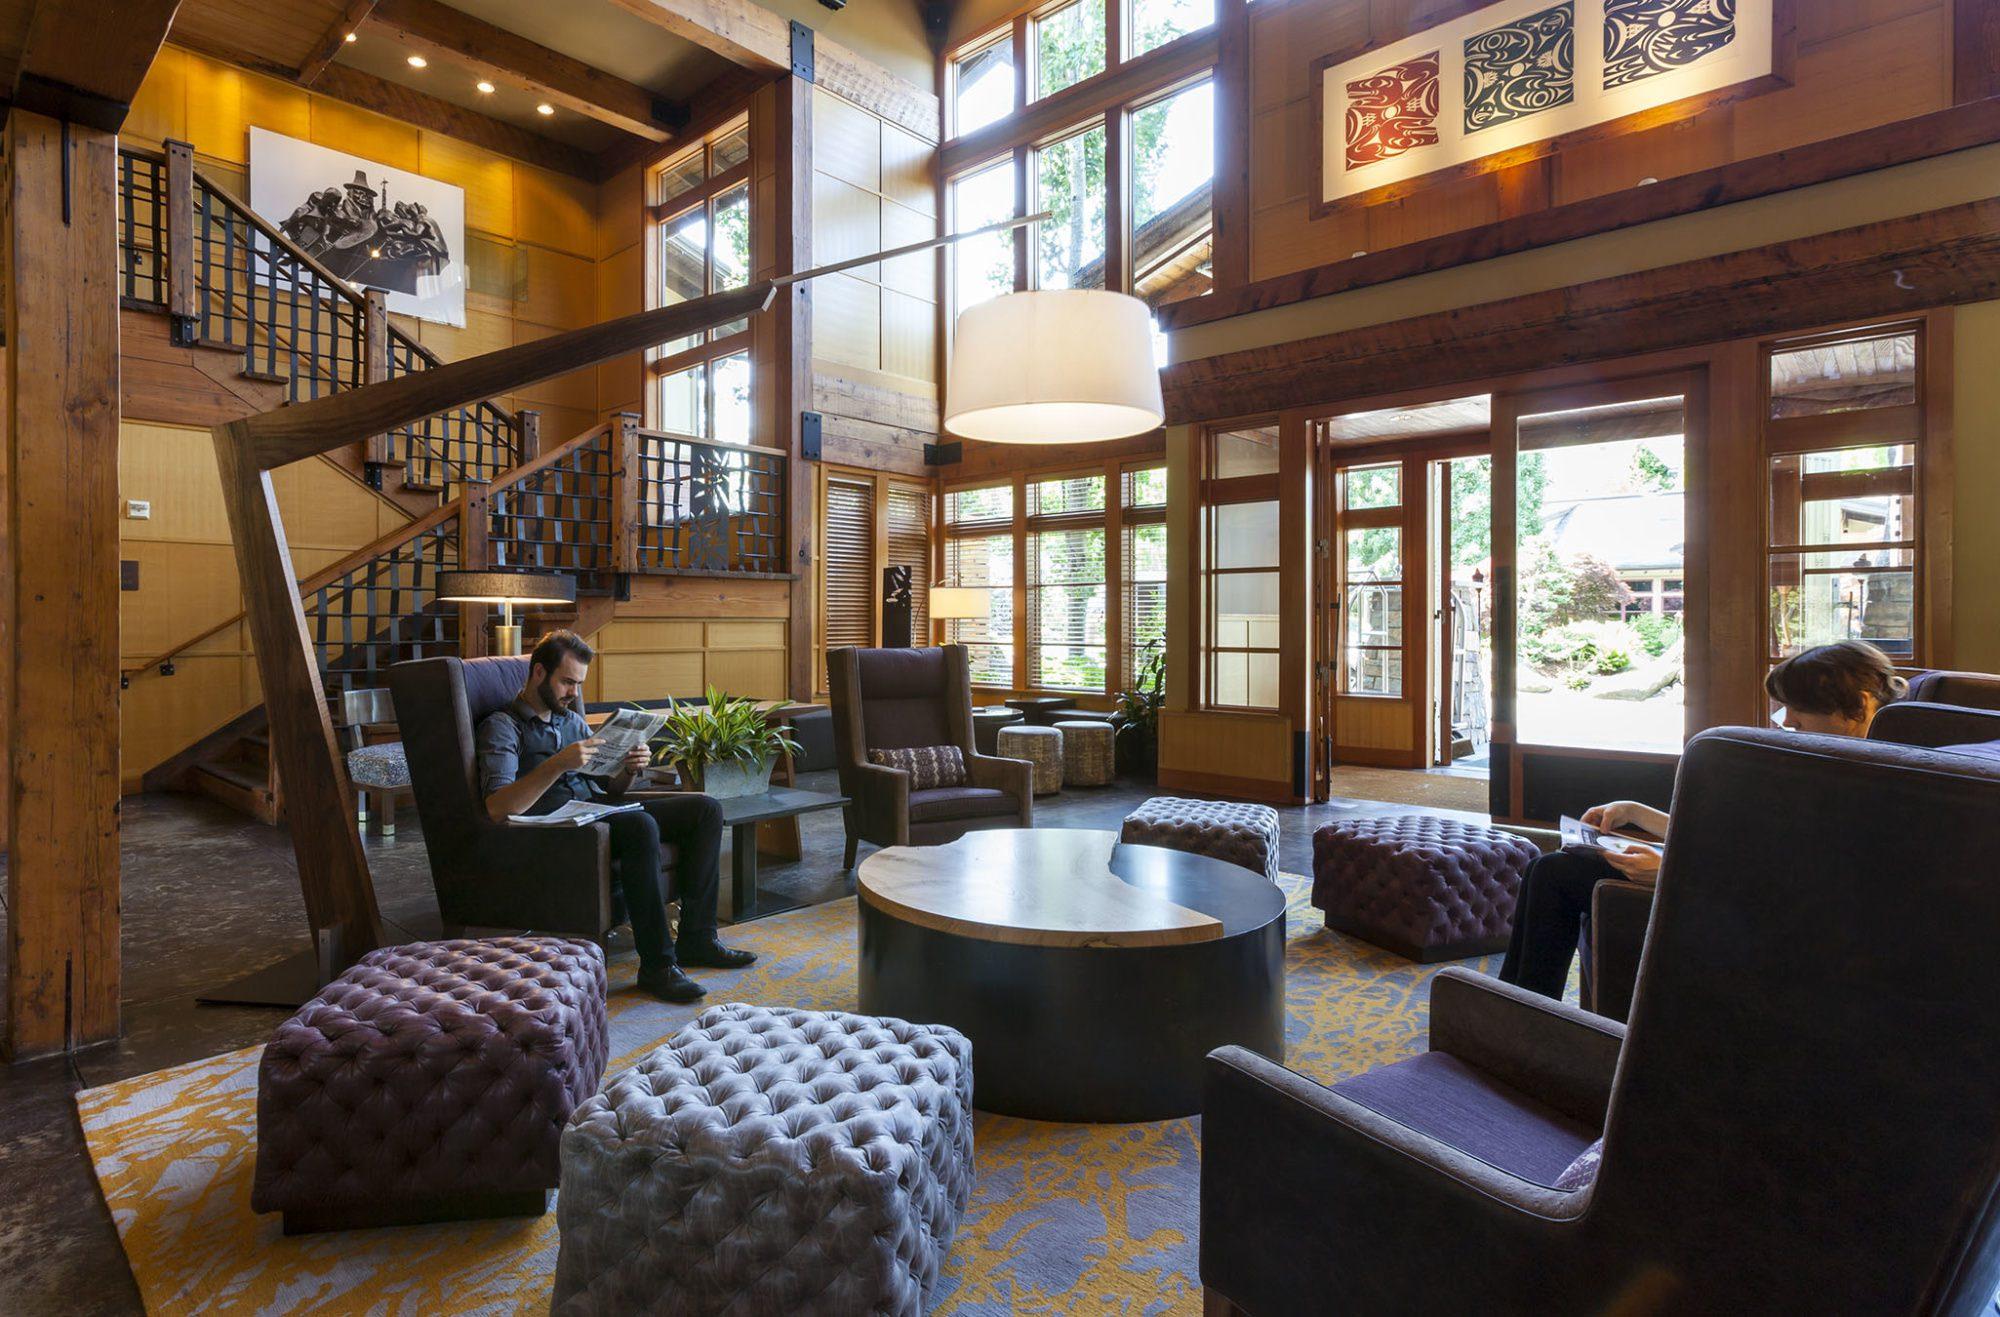 Willows Lodge Interior Design